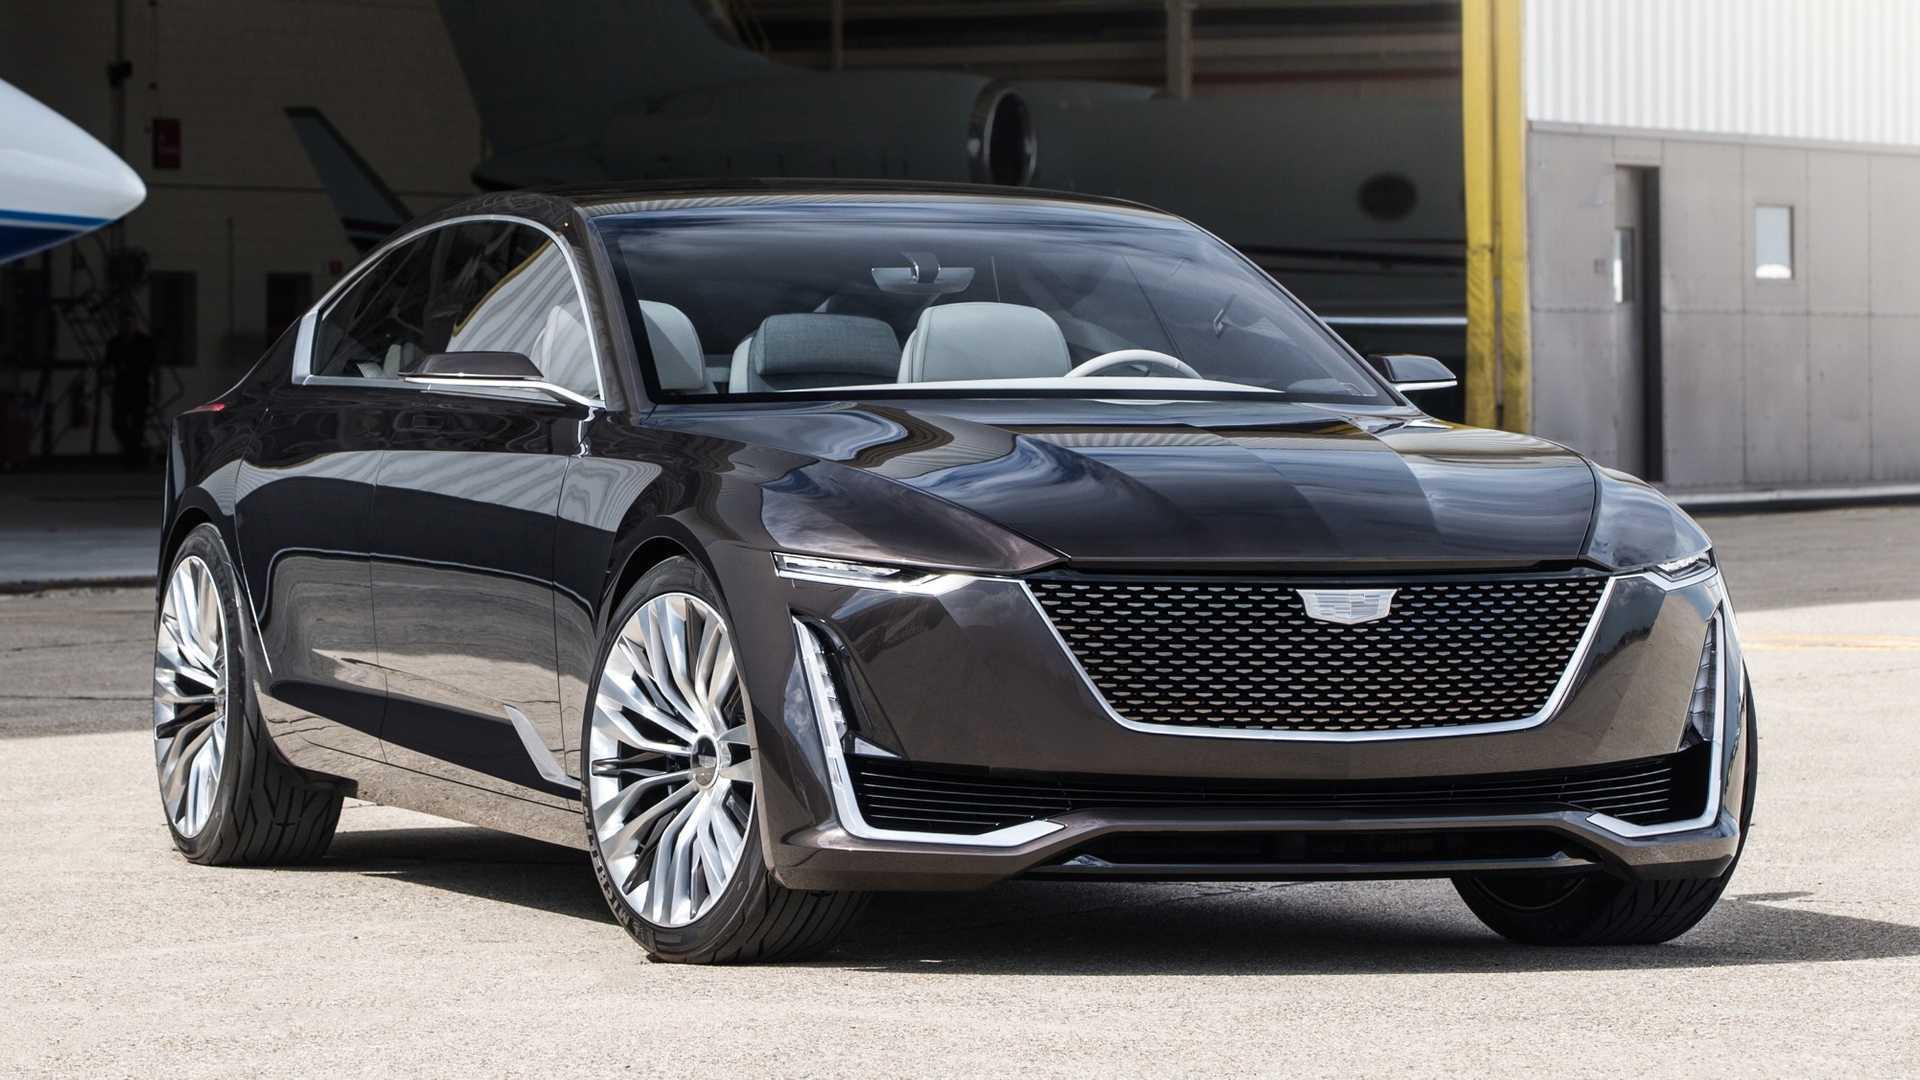 Best Luxury Sedan 2021 2021 New Models Guide: 30 Cars, Trucks, And SUVs Coming Soon